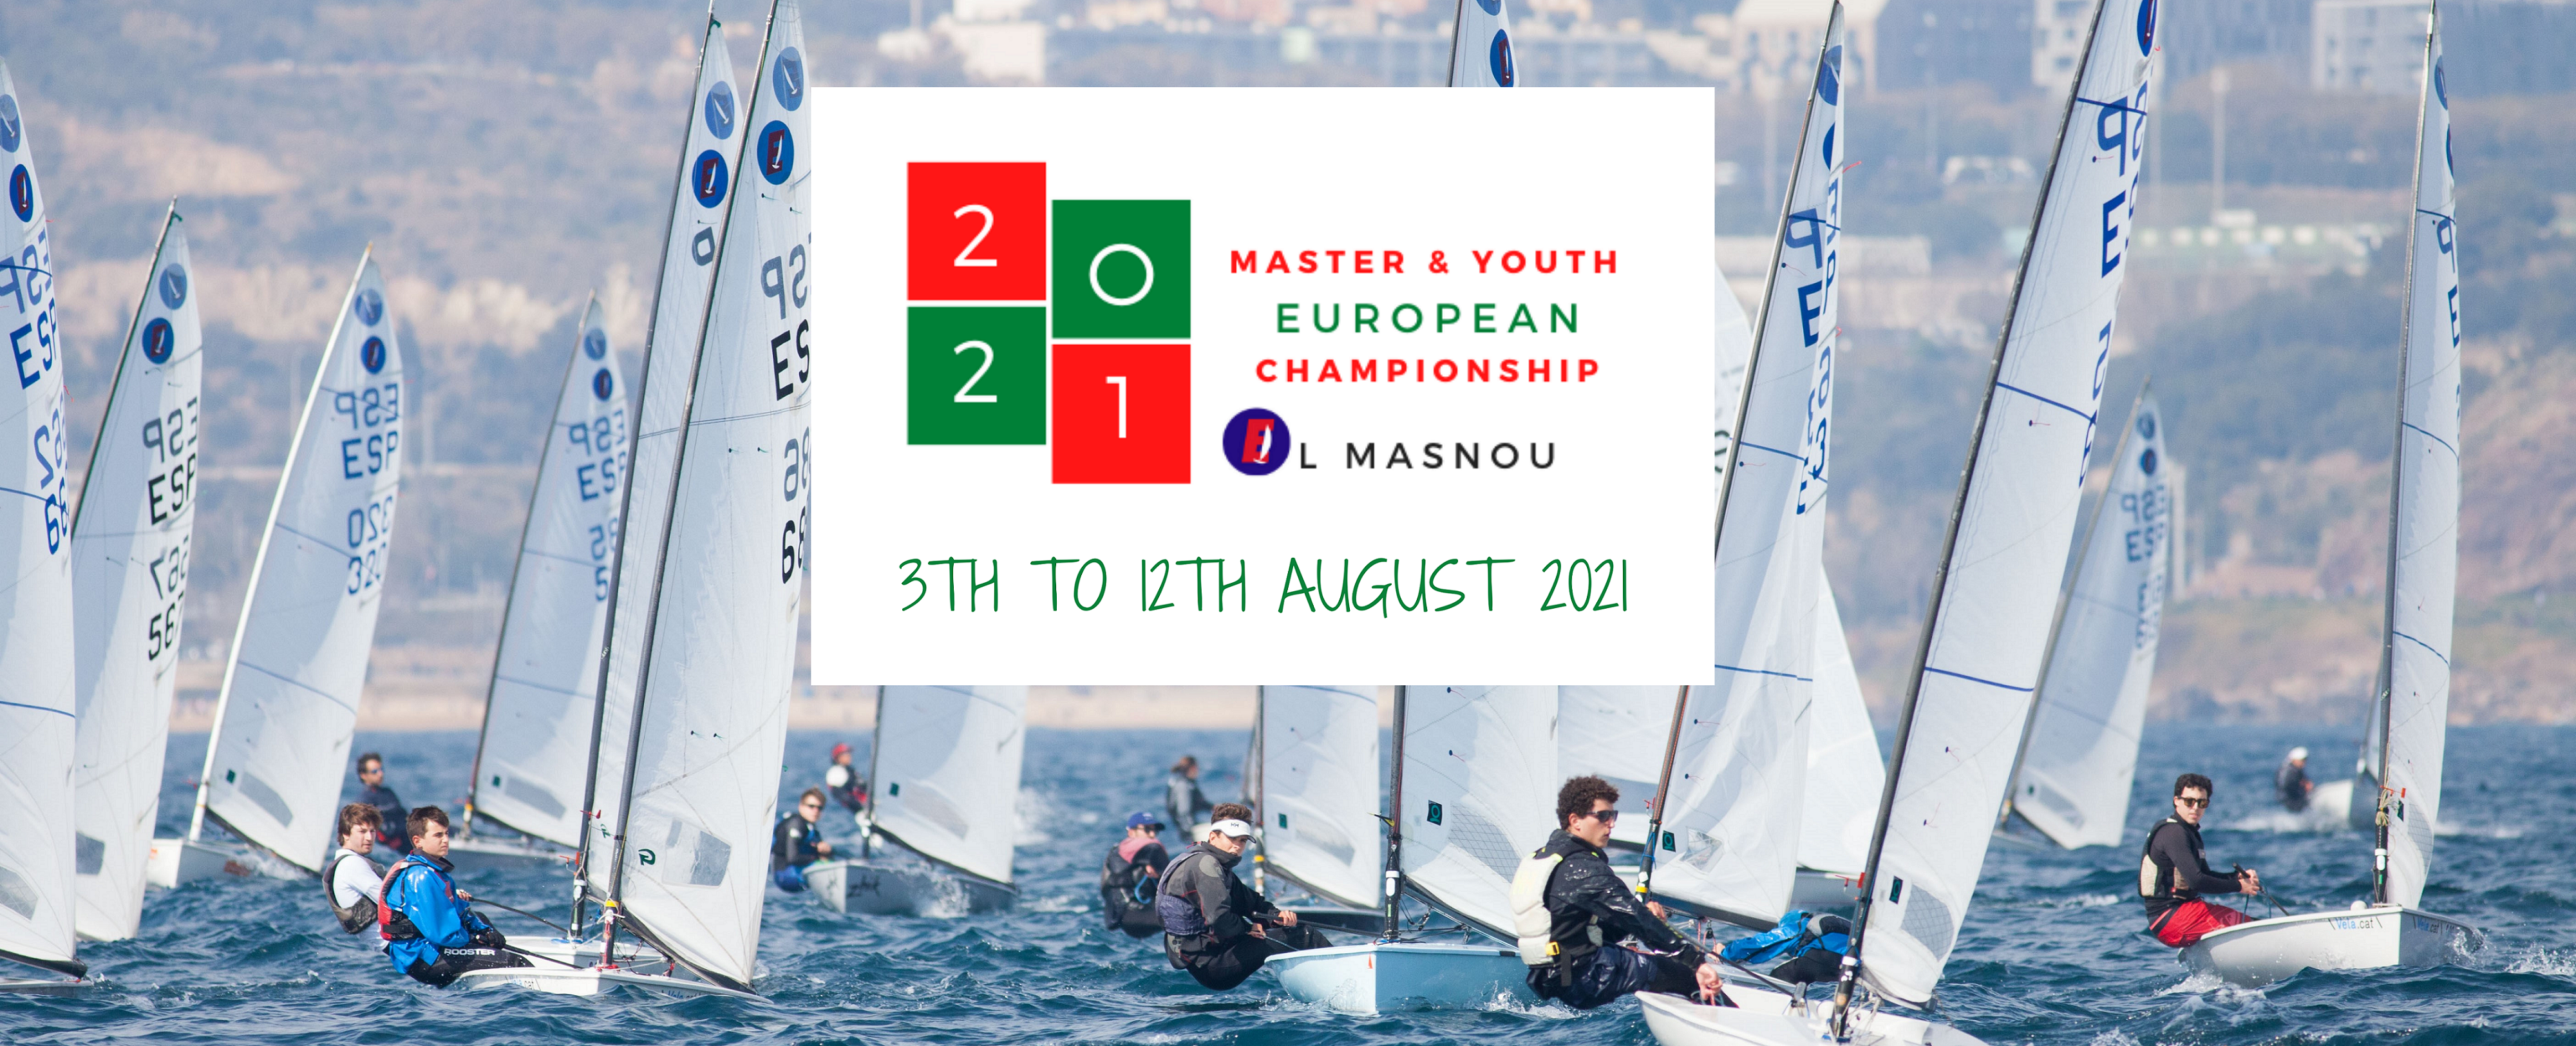 Tot a punt per al Youth European Championship de la classe Europa 2021 - El Masnou, Europa, Youth European Championship - EUROPA